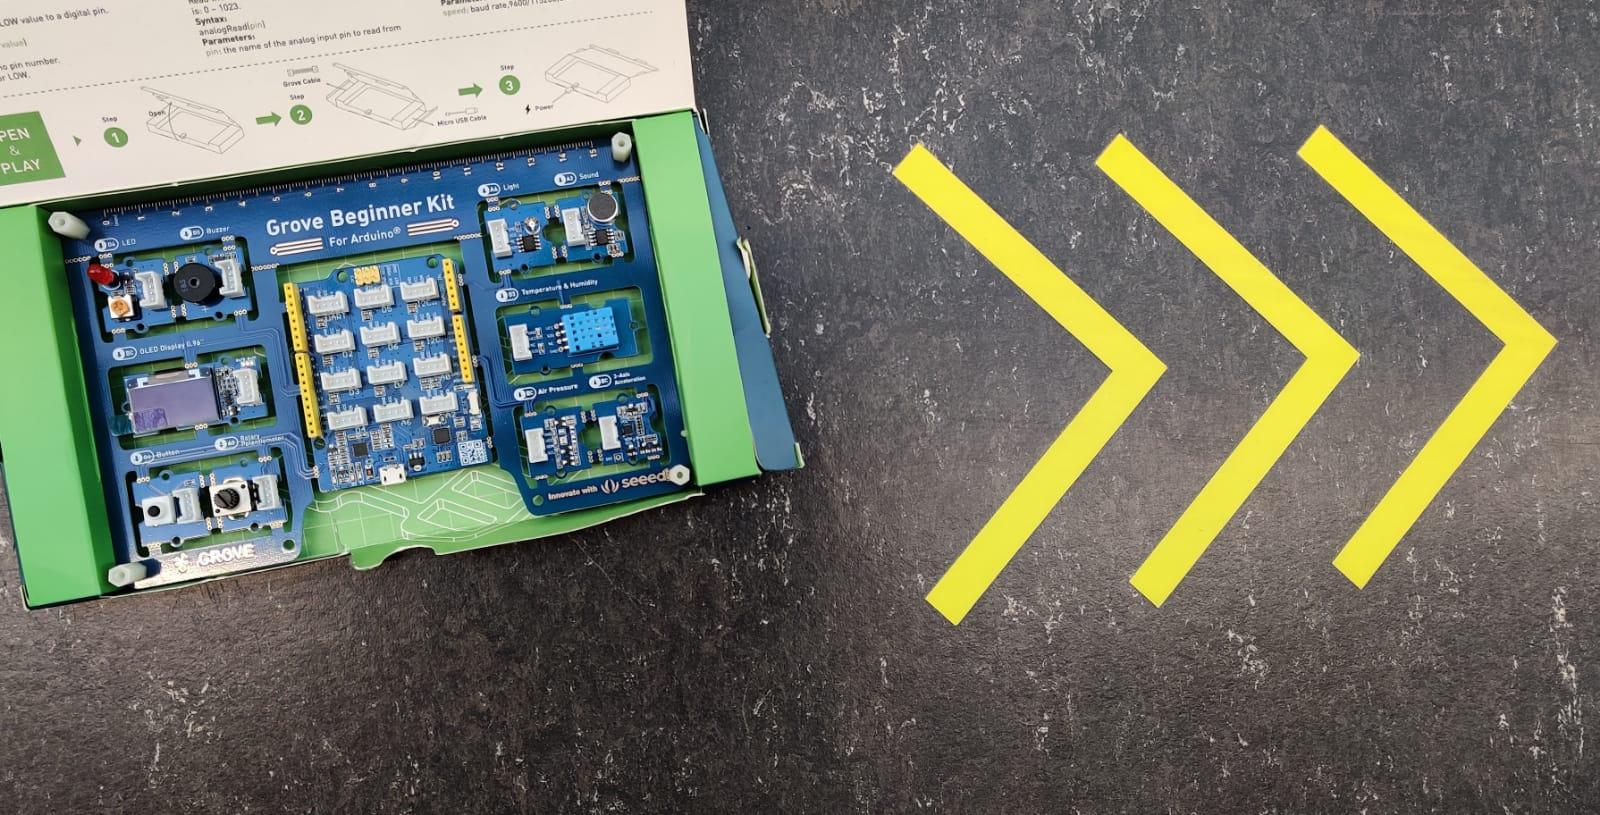 Ondersteuning – Grove Beginner Kit for Arduino